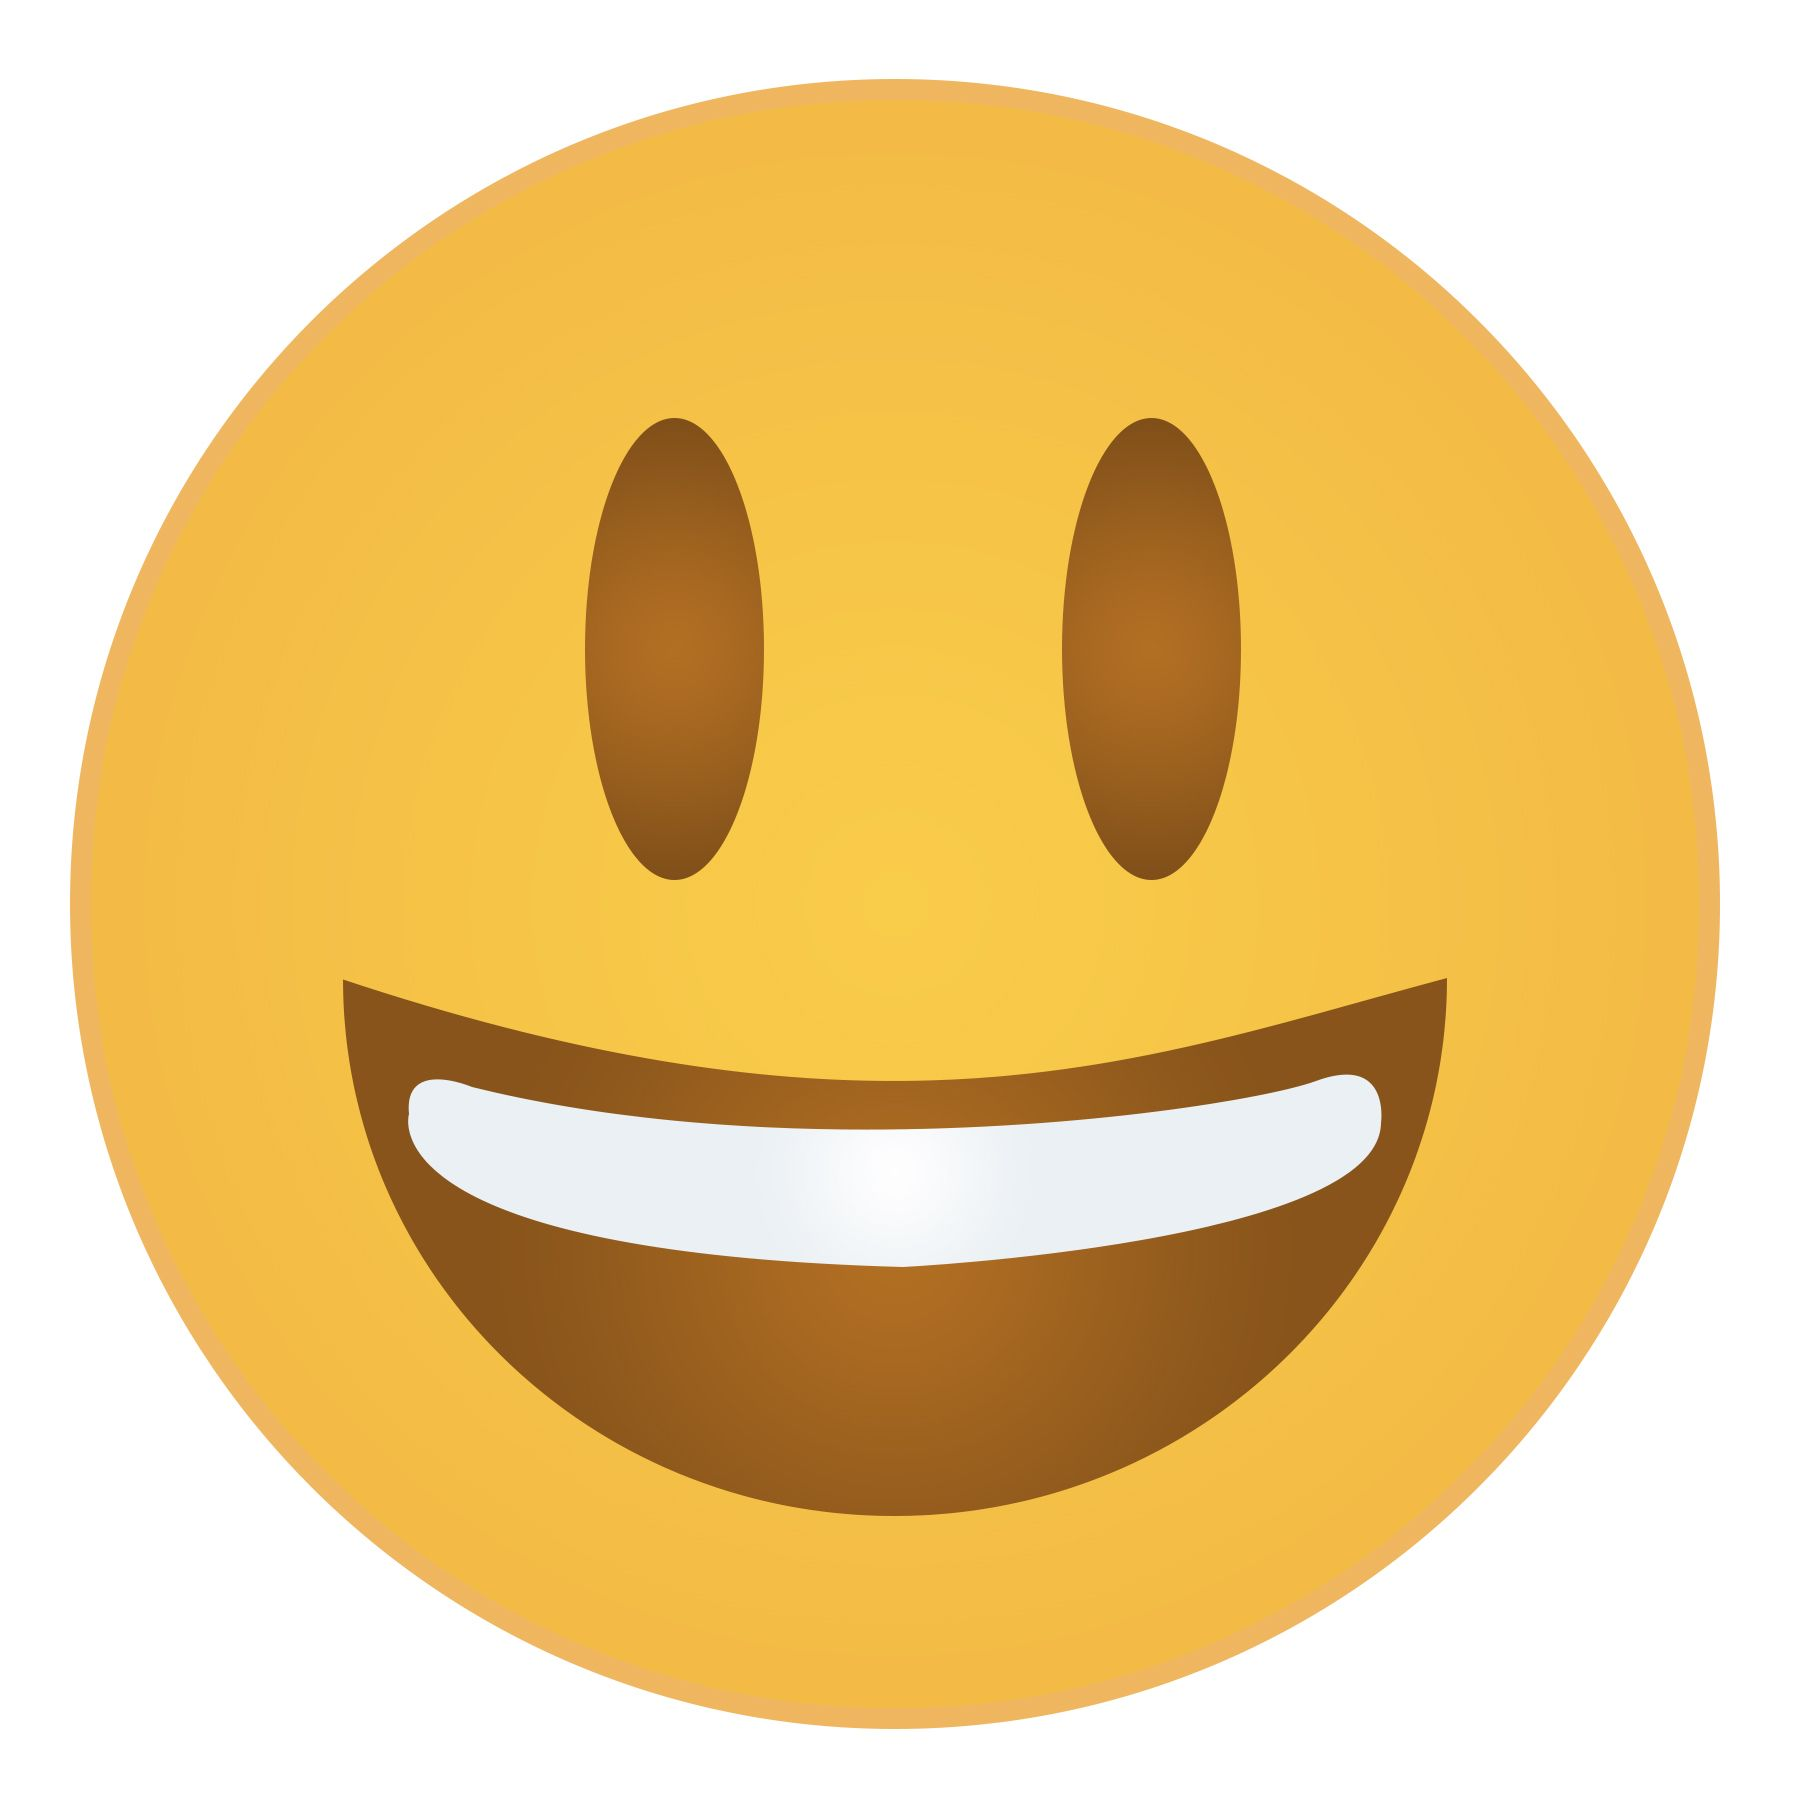 Emoji Images Printable